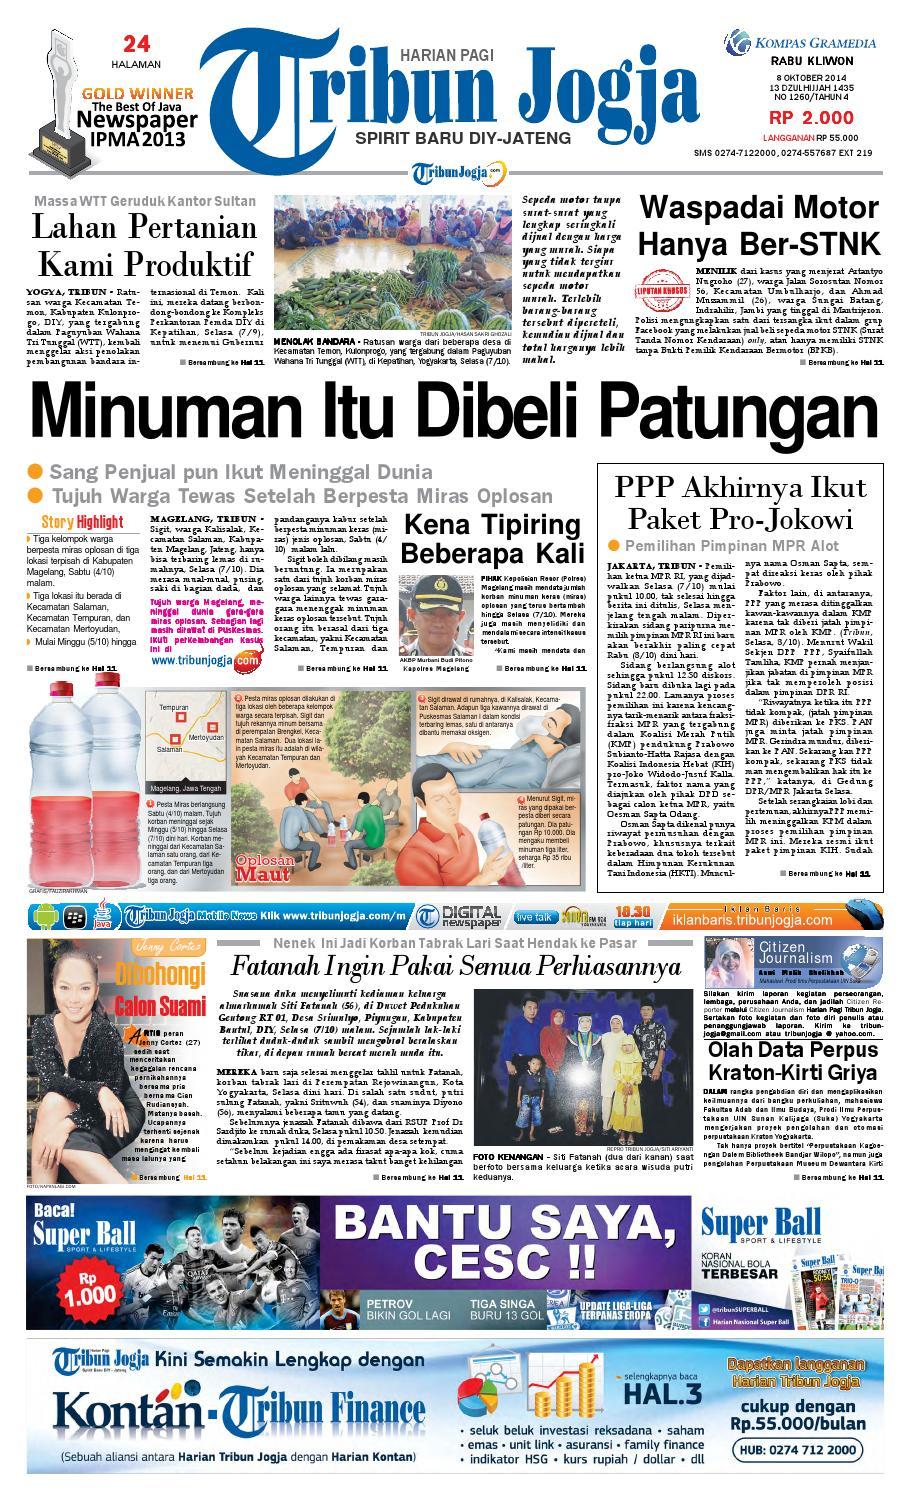 Tribunjogja 08 10 2014 By Tribun Jogja Issuu Produk Ukm Bumn Mahkota Papua Bin Syowi